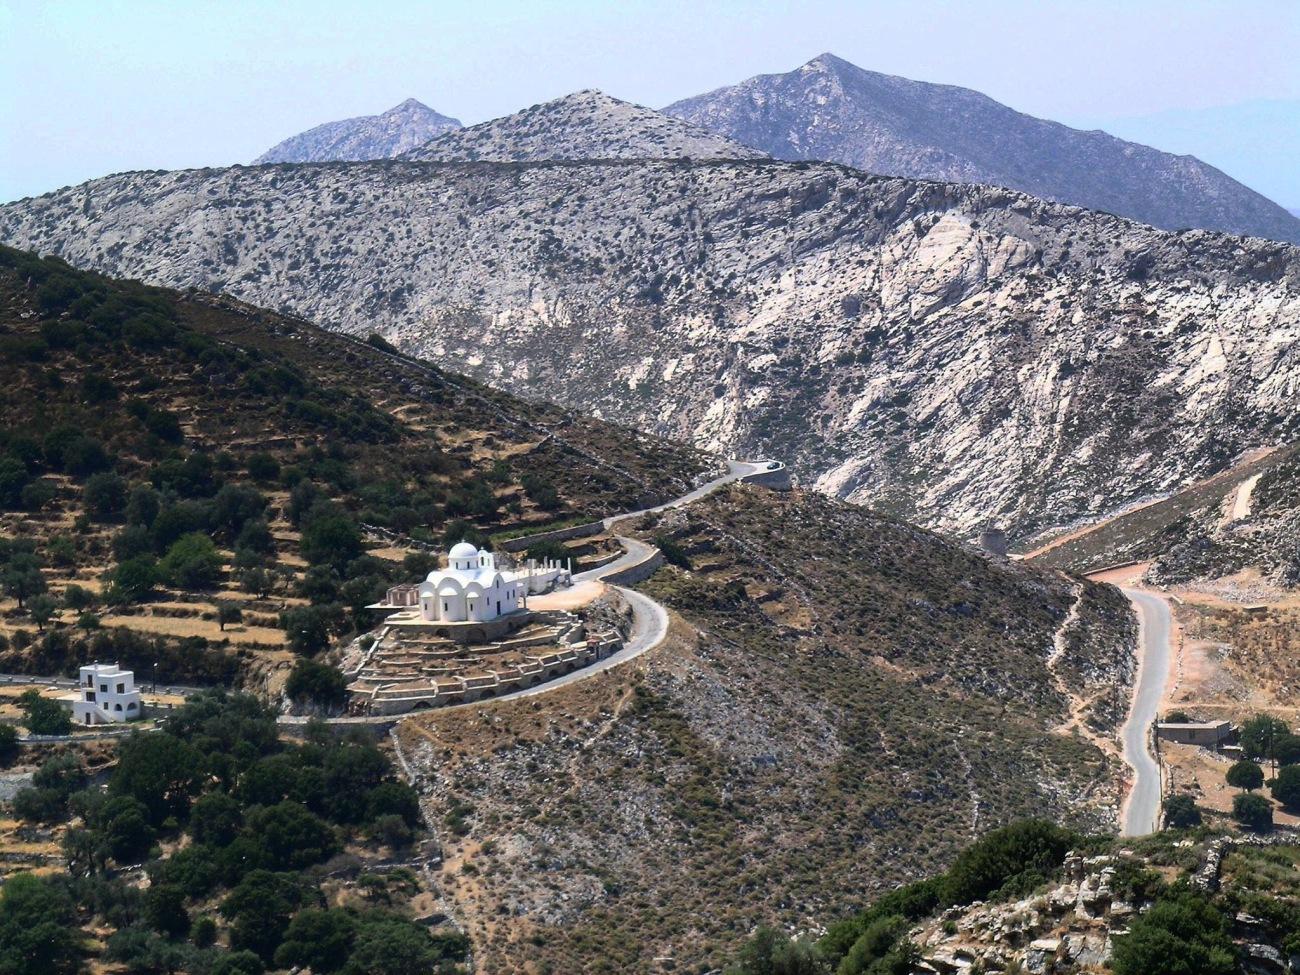 Riding to Chora - Amorgos